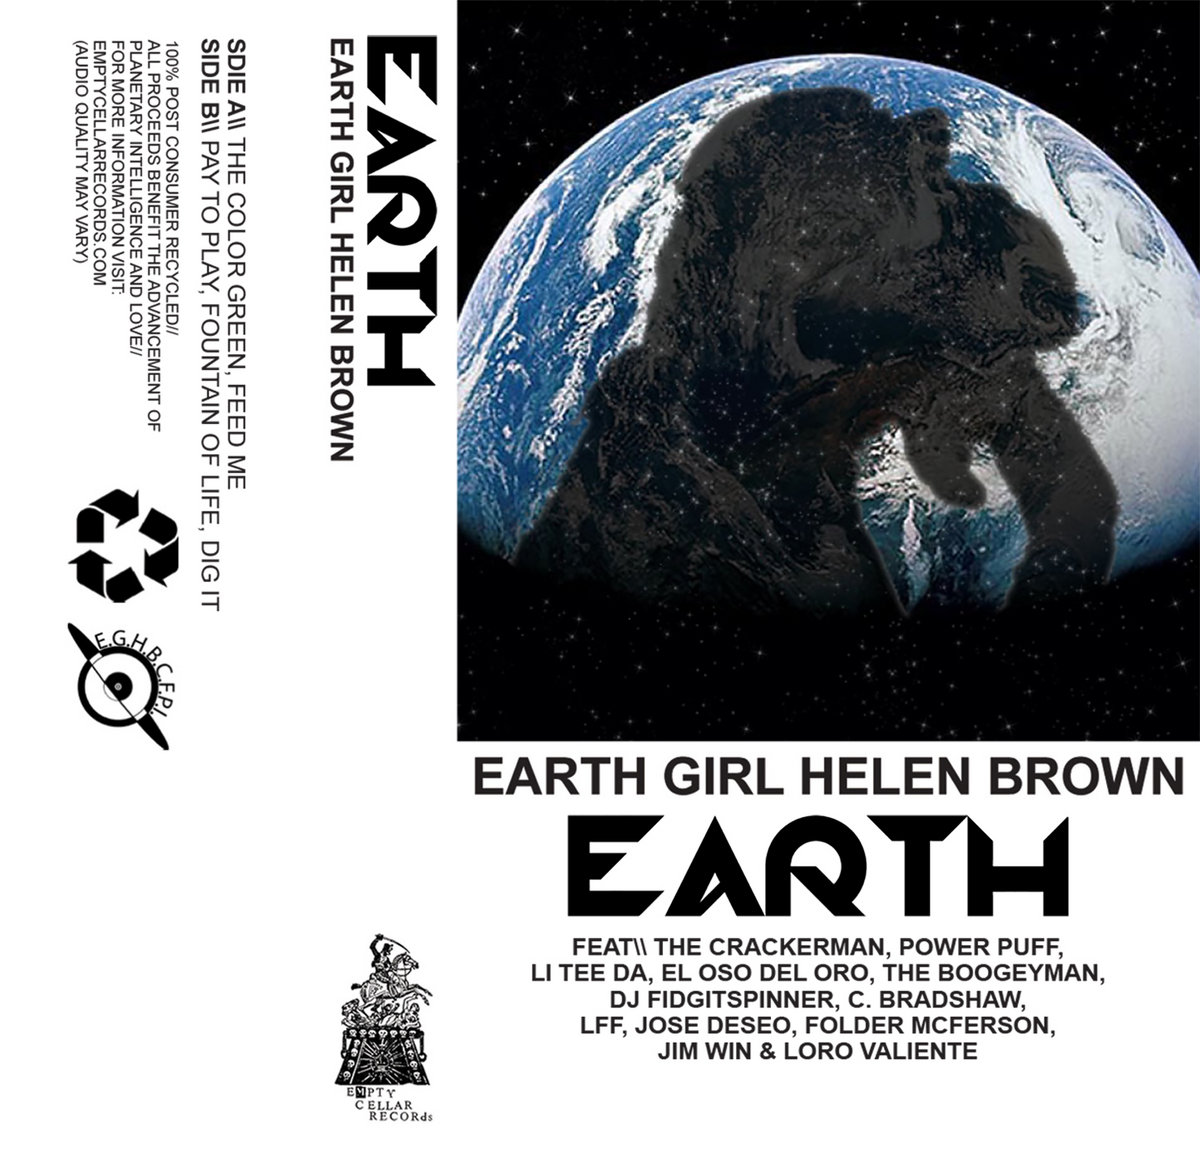 Earth Girl Helen Brown - Earth